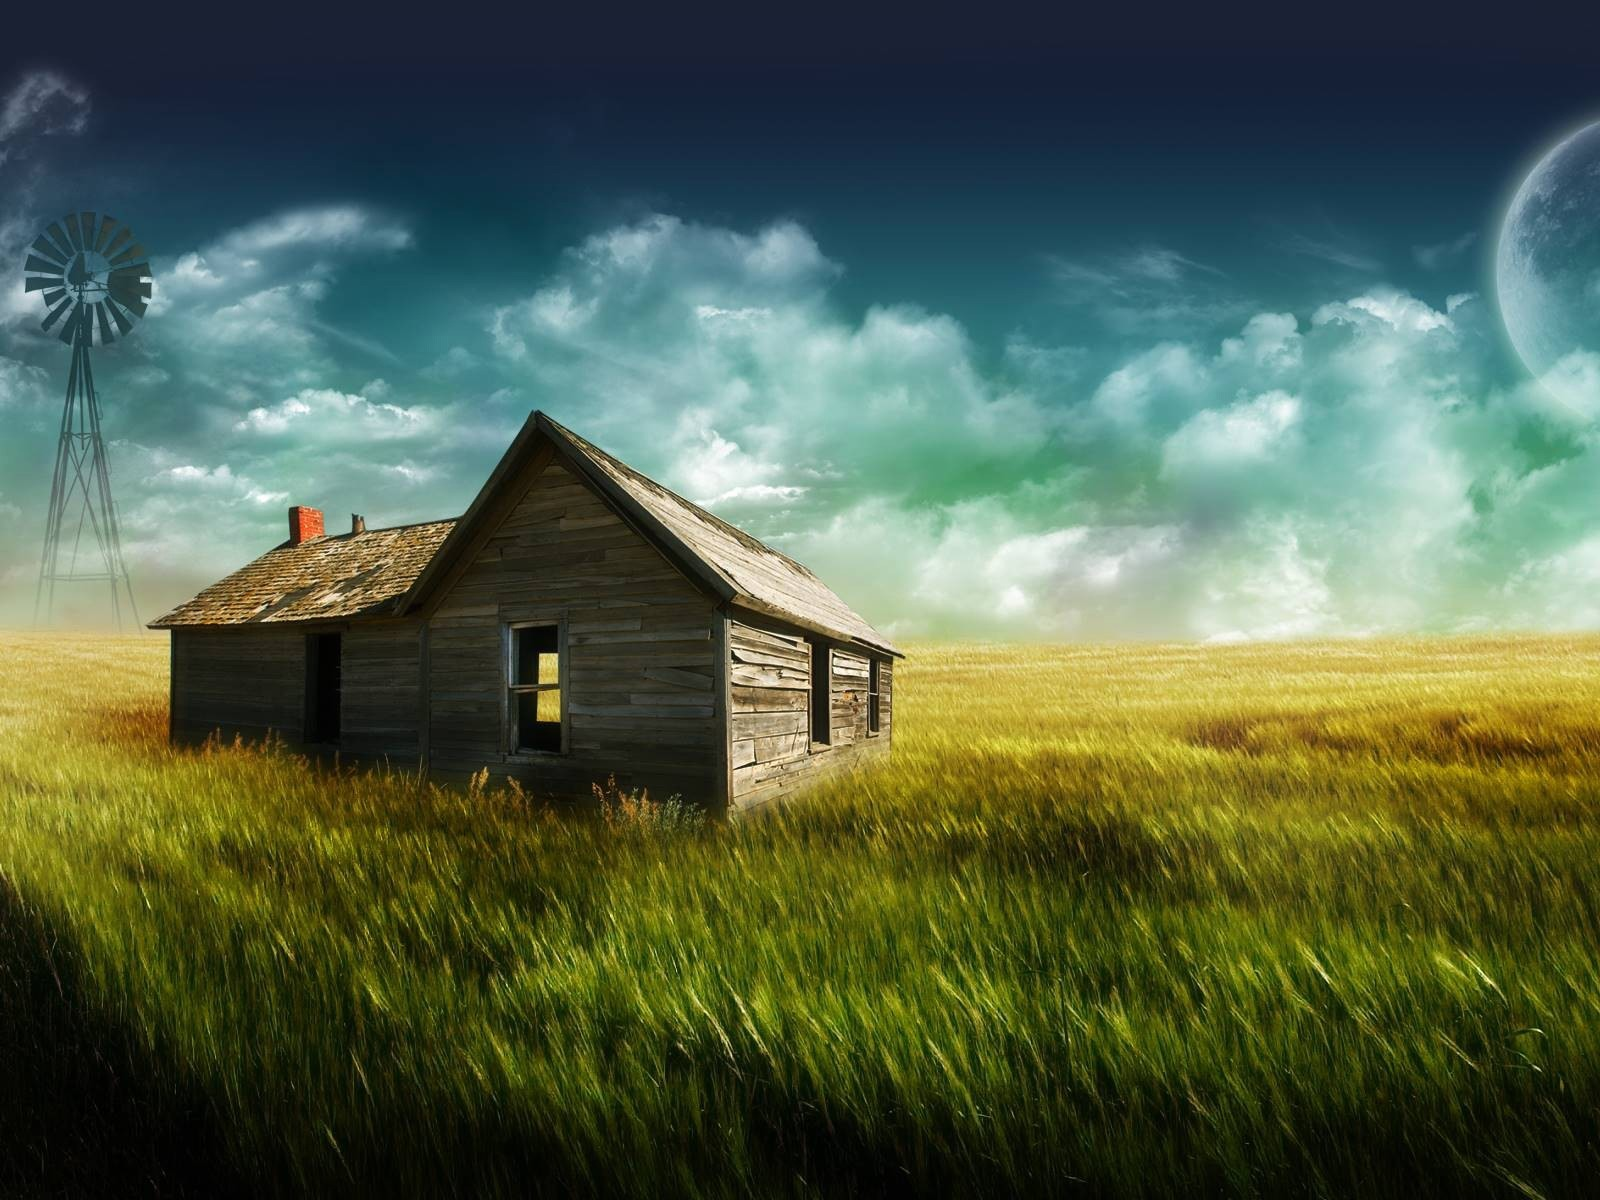 The Farmhouse desktop wallpaper 1600x1200